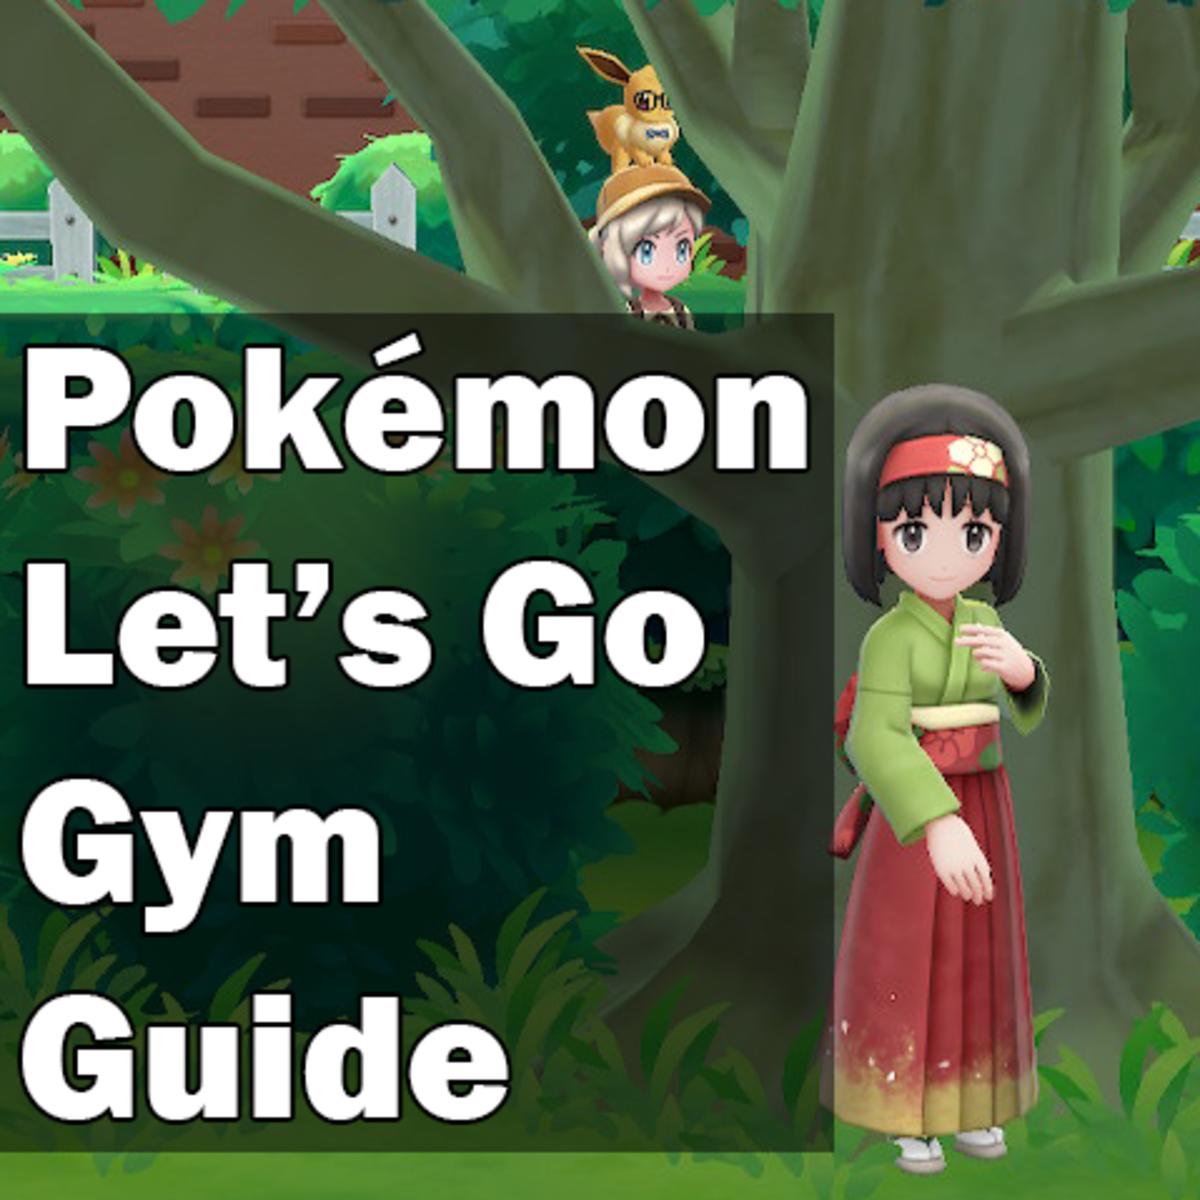 Pokémon Let's Go Gym Guide